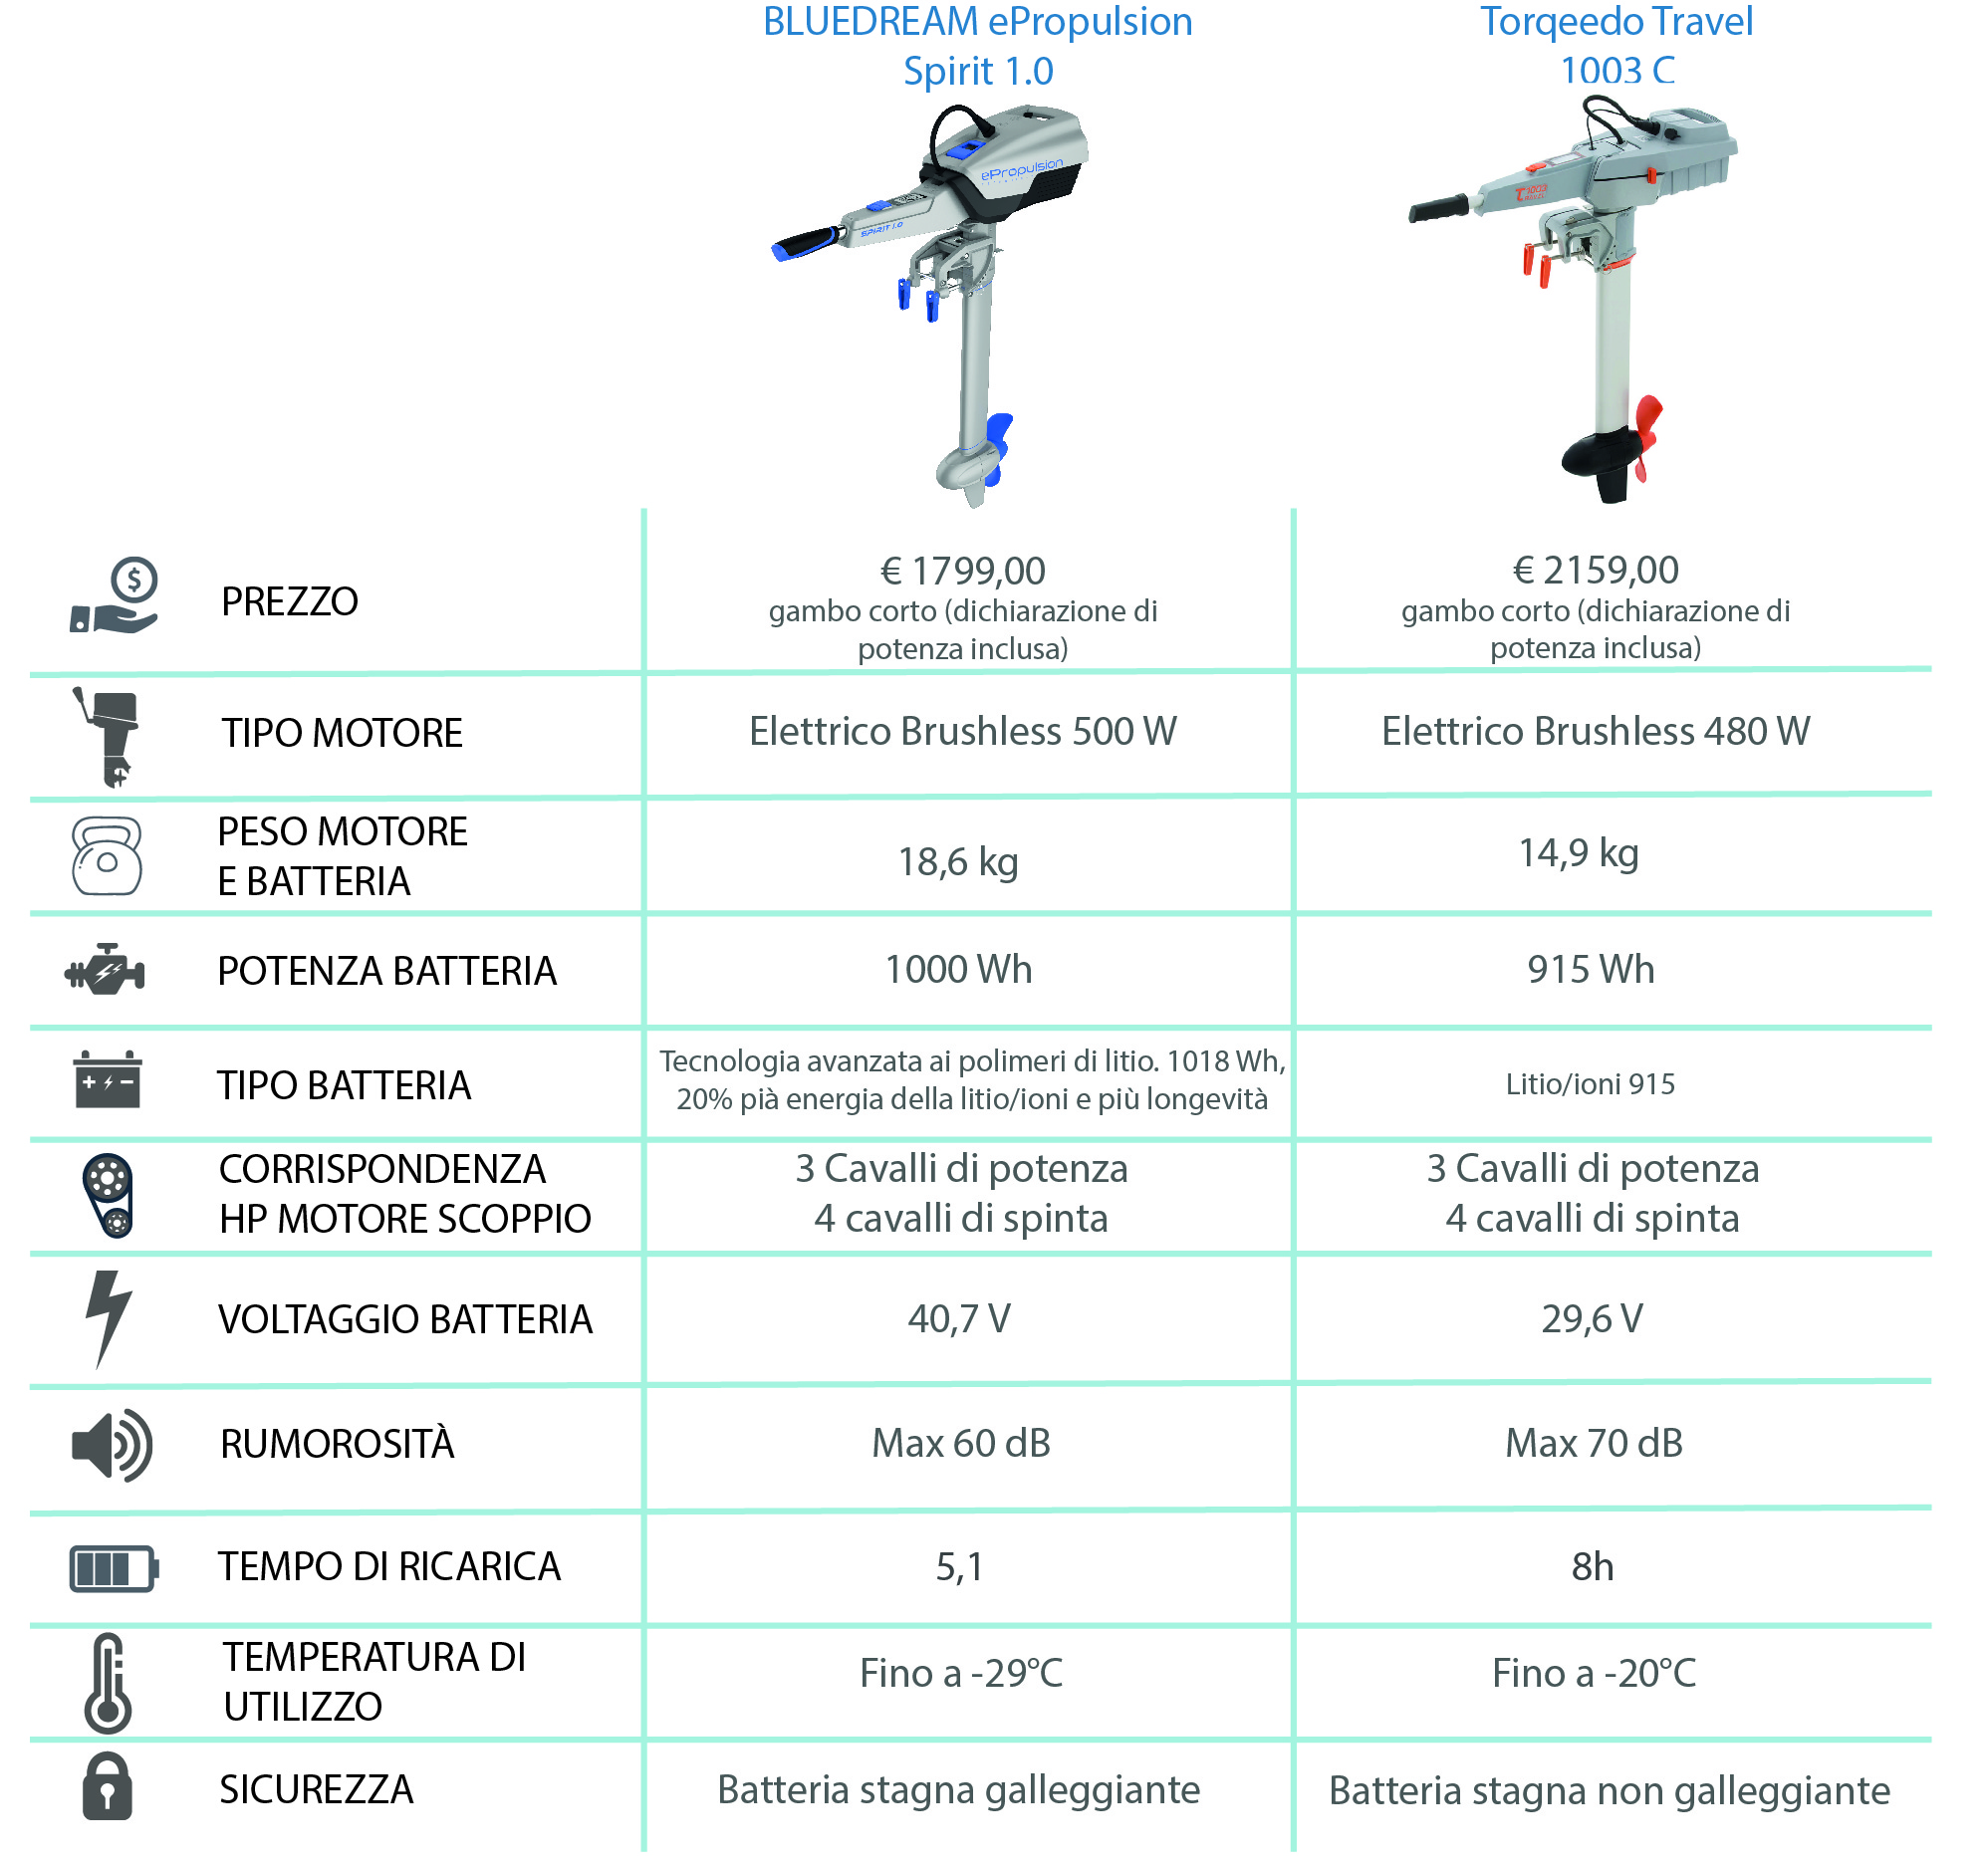 comparativa ePropulsion